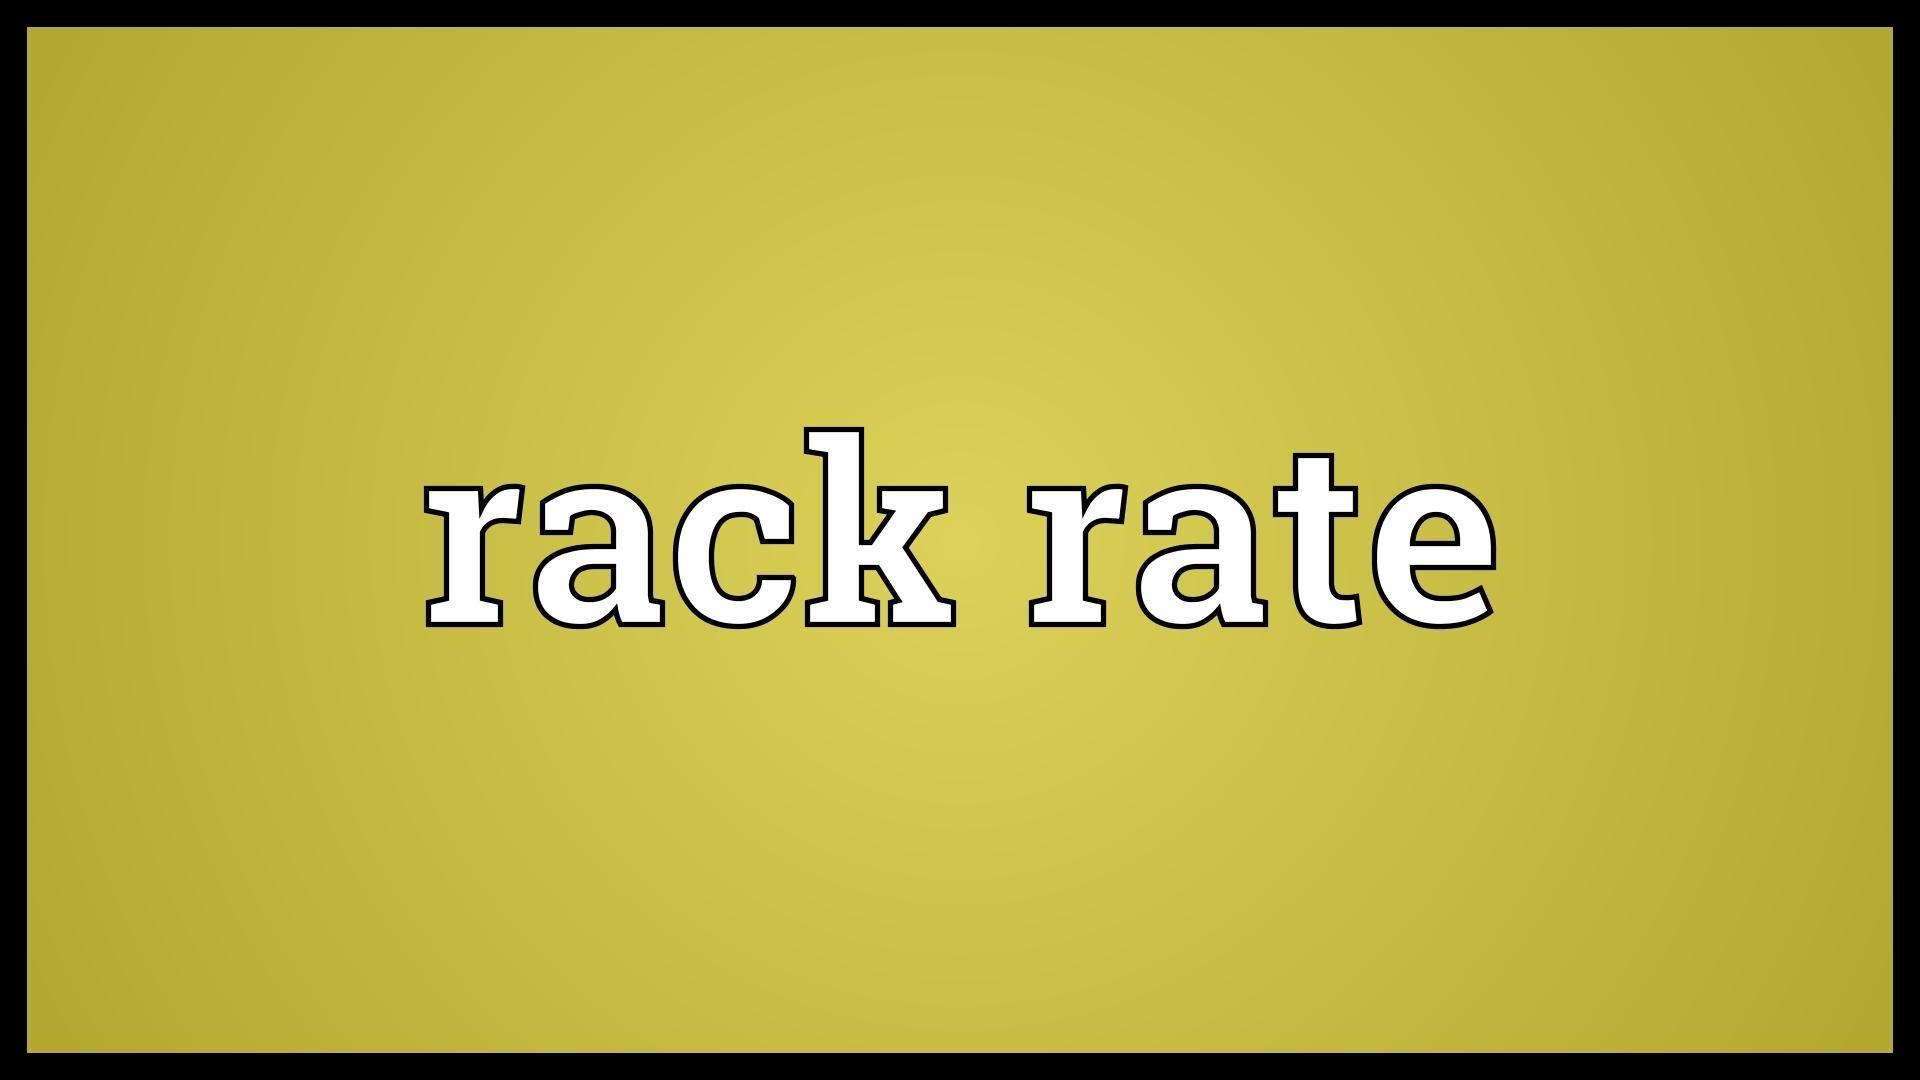 rackrate